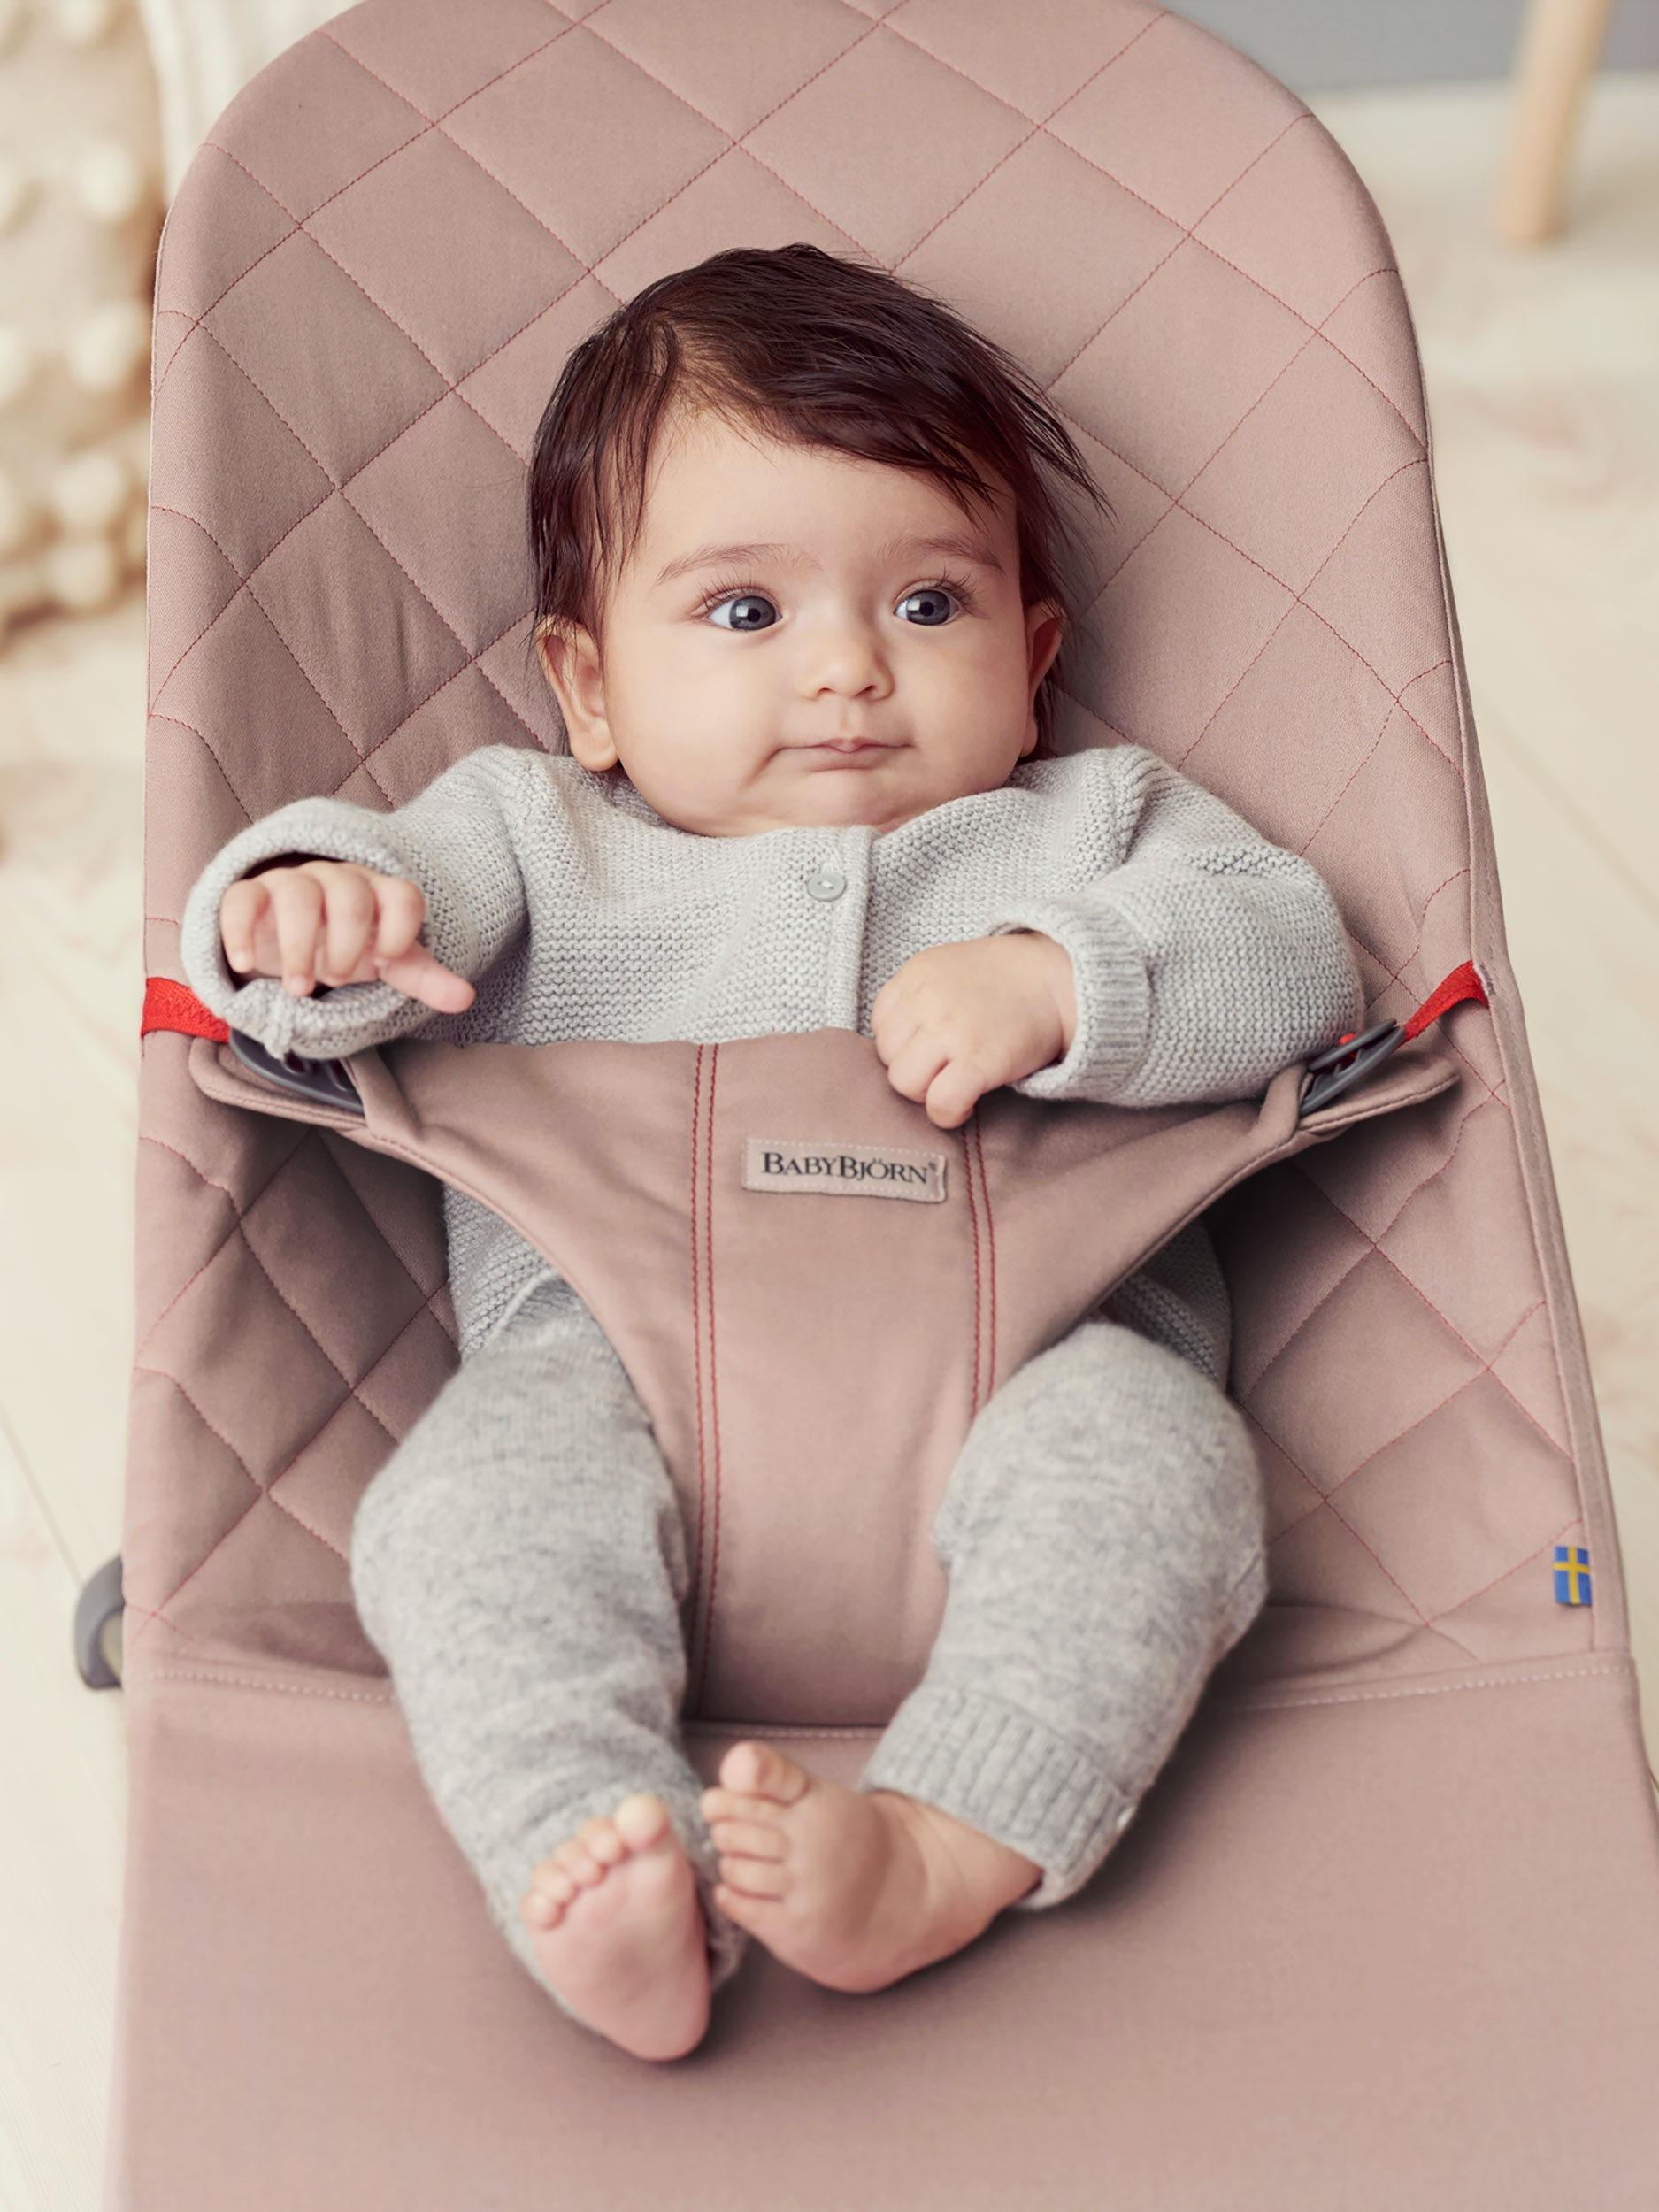 Babysitter Bliss i Antikrosa Cotton - BABYBJÖRN